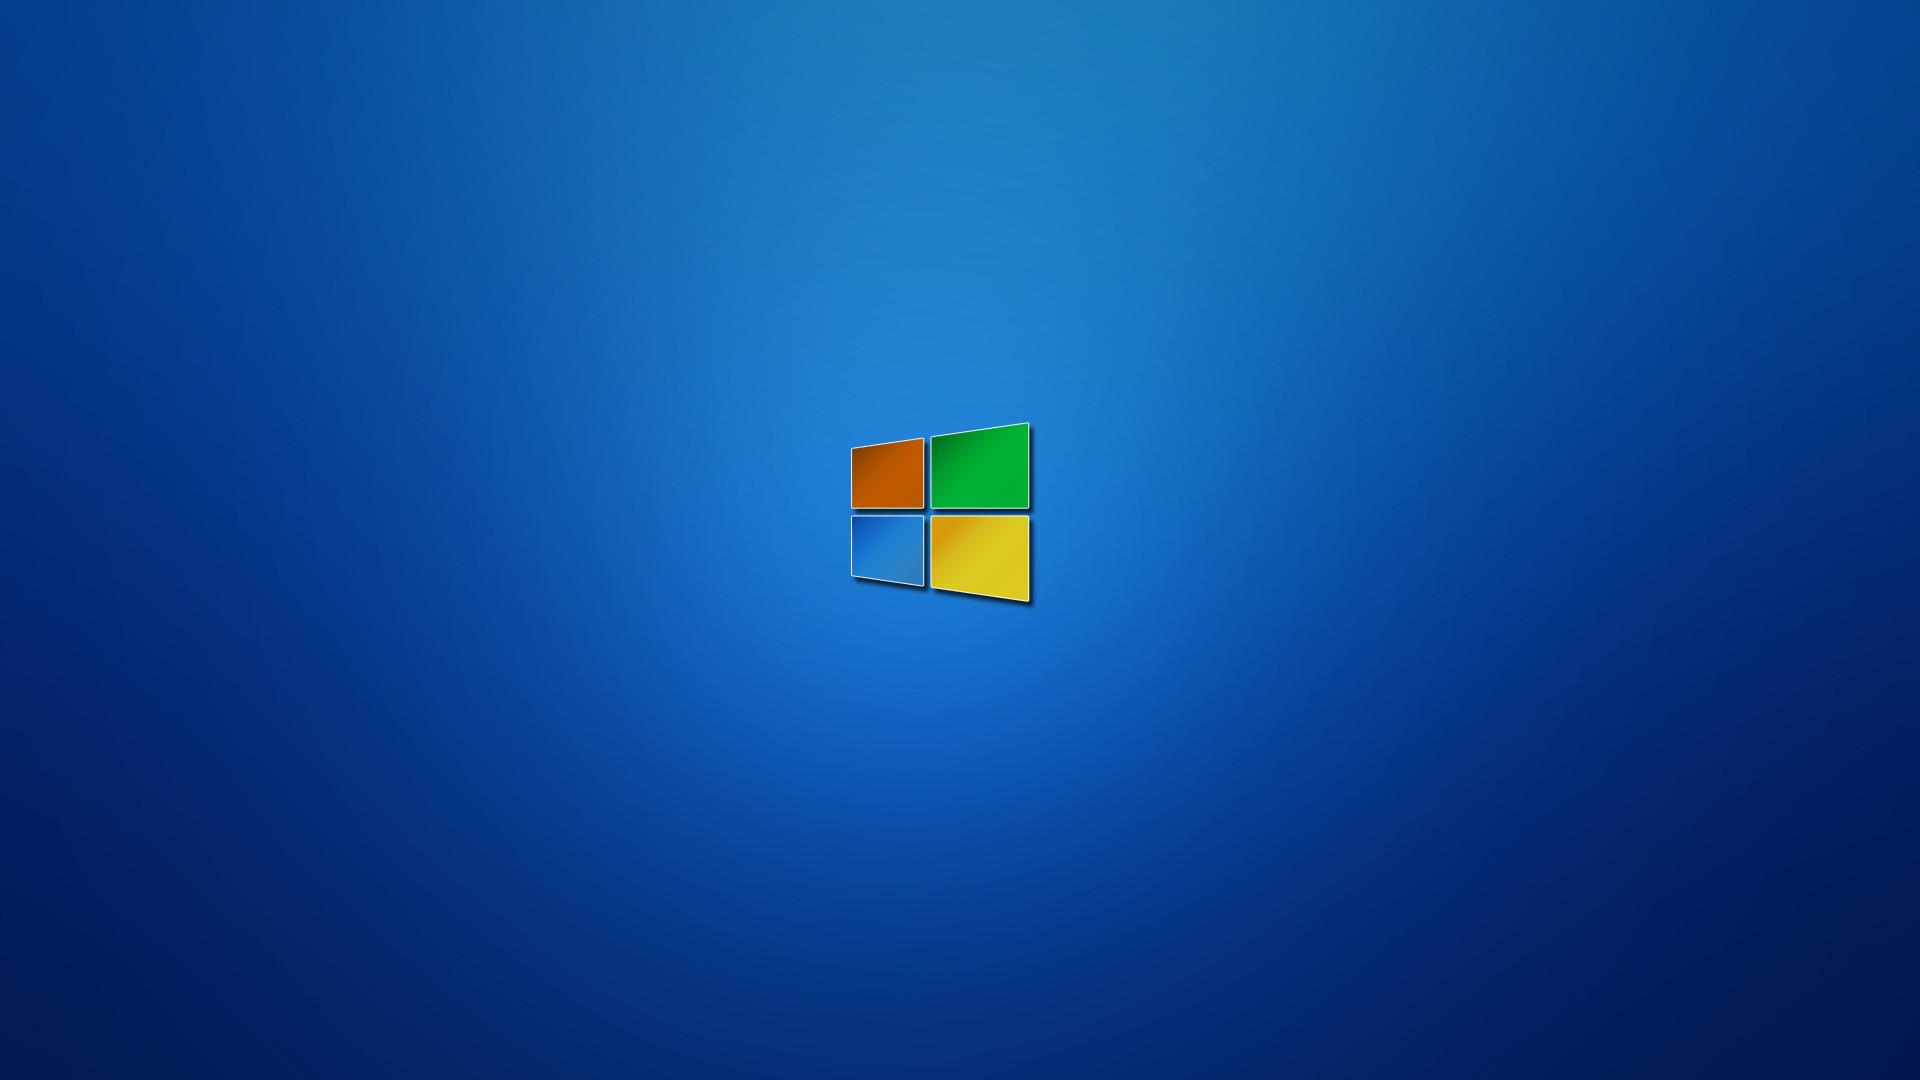 Wallpaper Windows 8  № 1929004 бесплатно